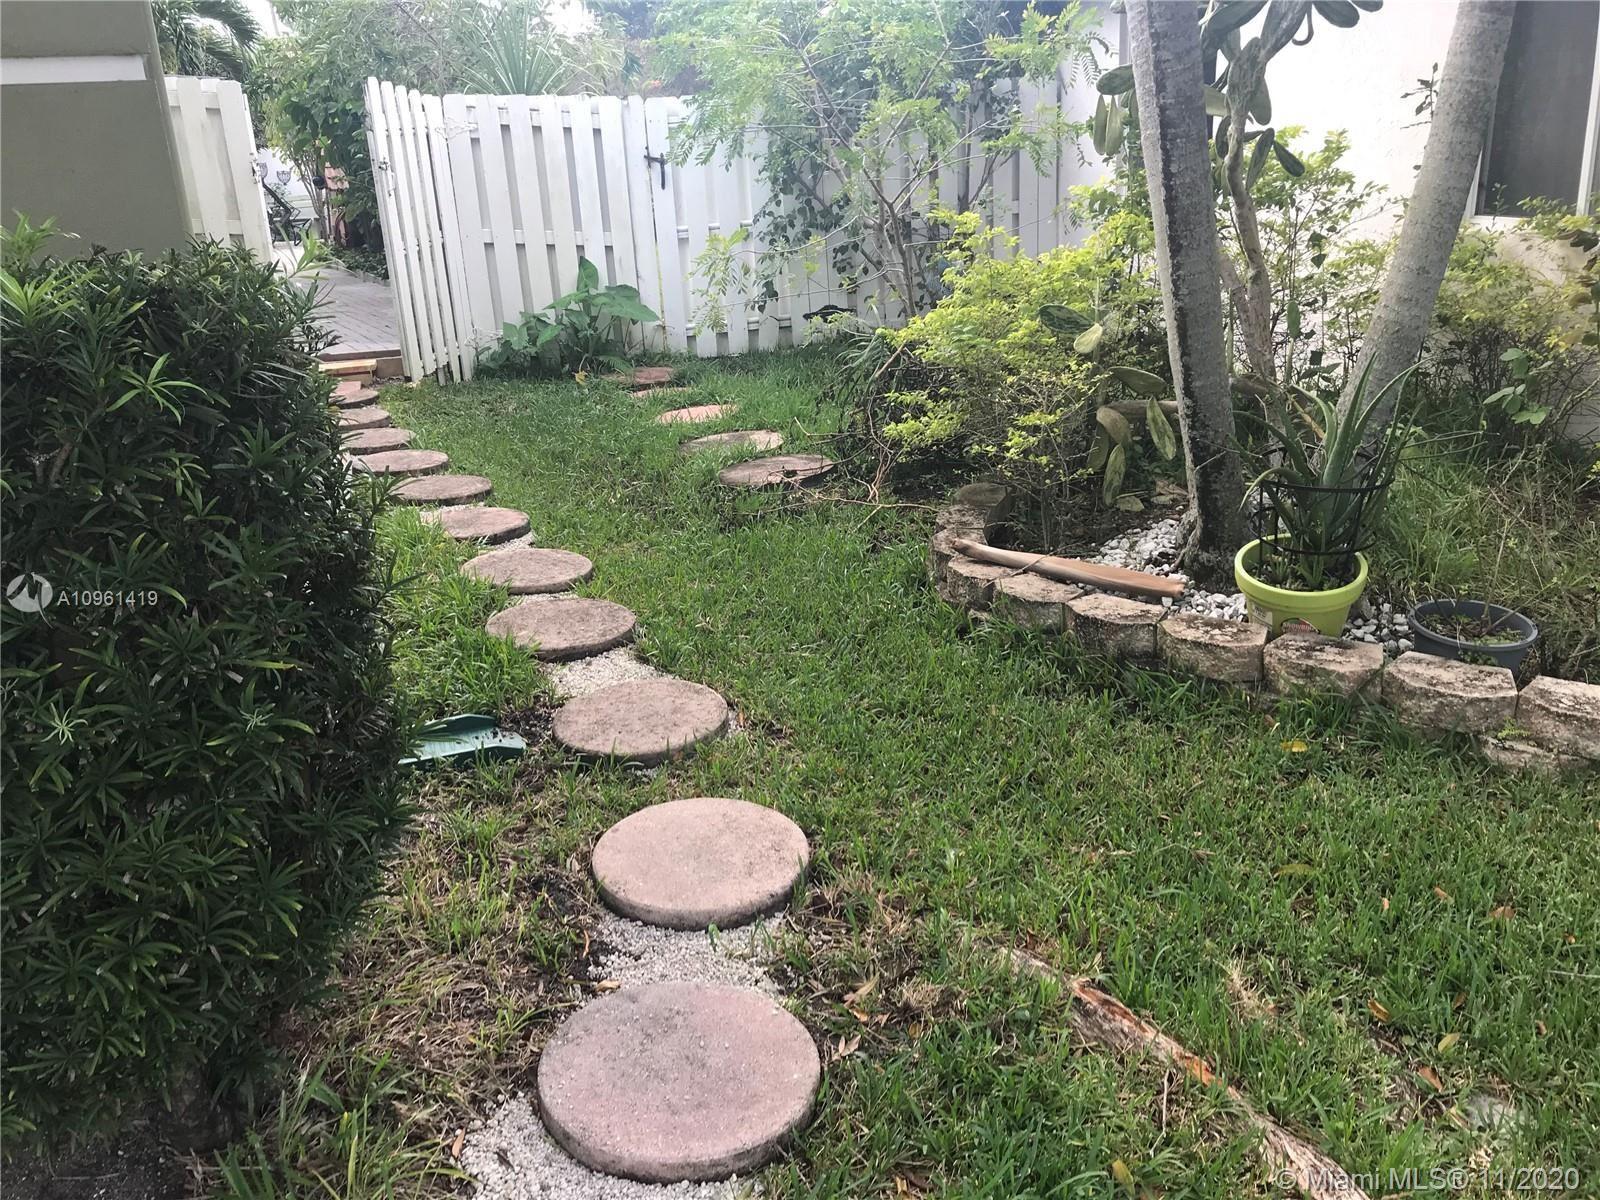 Photo of 721 NW 135 Way #721, Plantation, FL 33325 (MLS # A10961419)